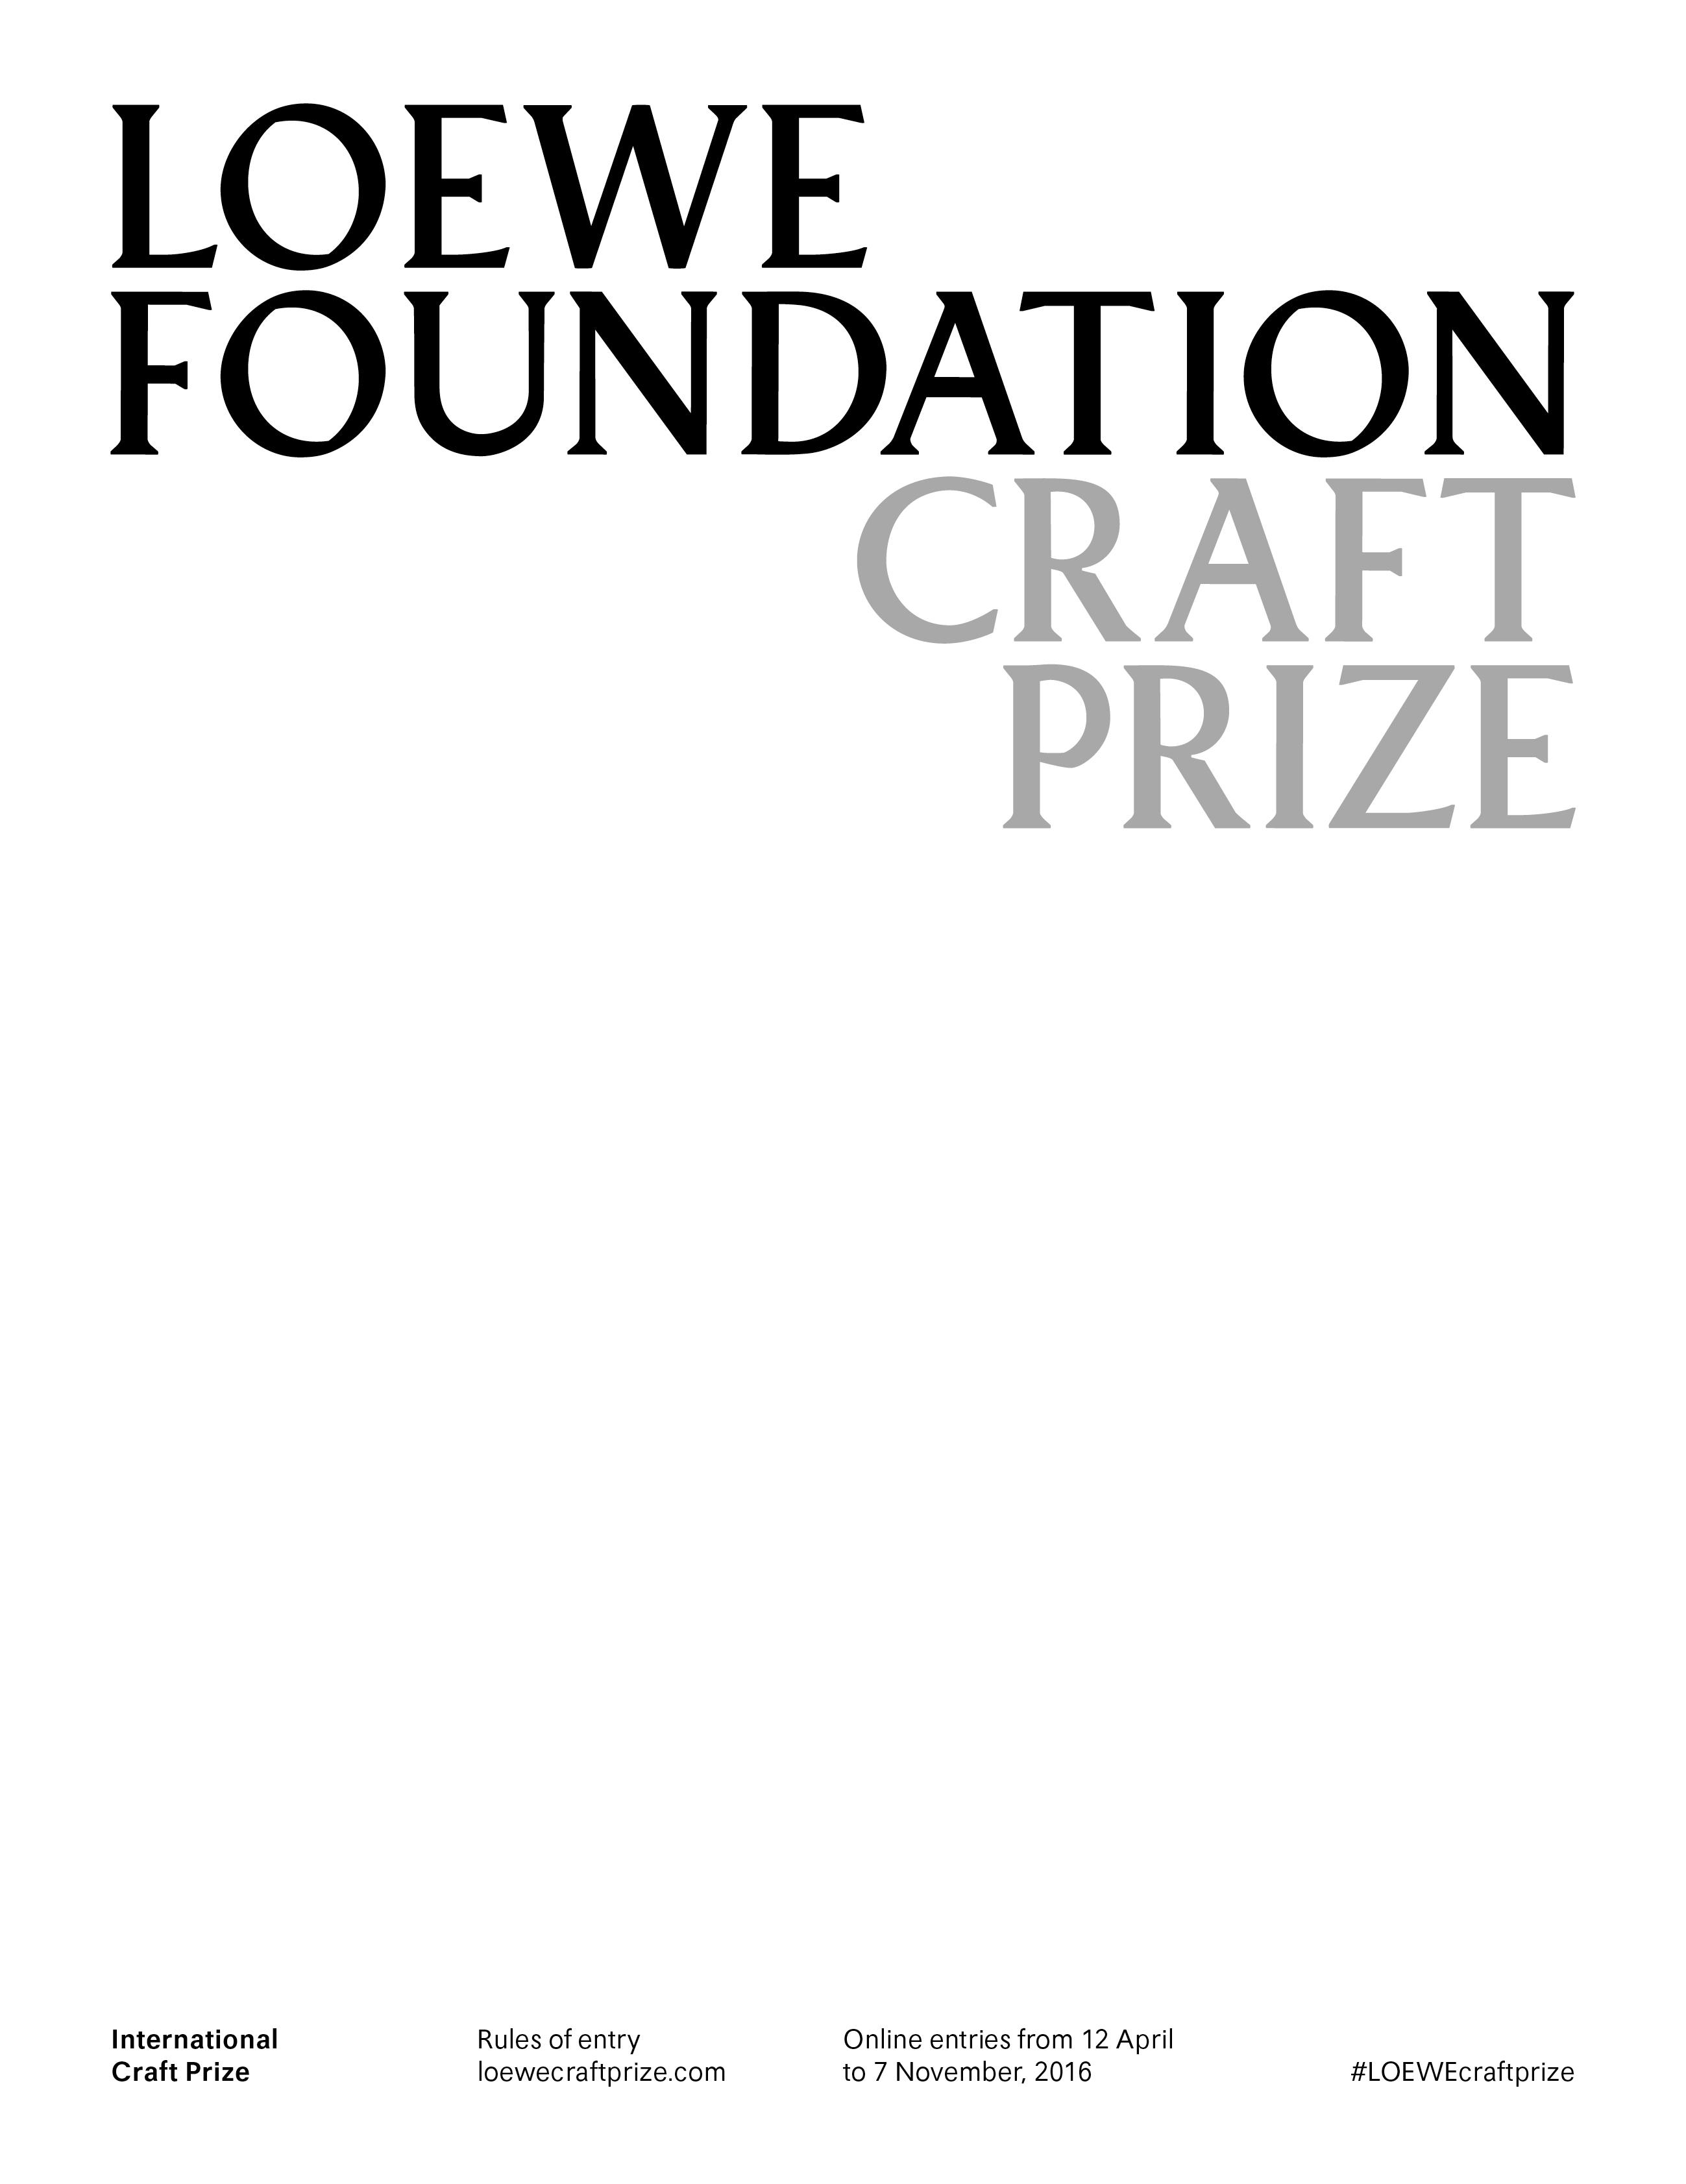 craft prize sp 2016